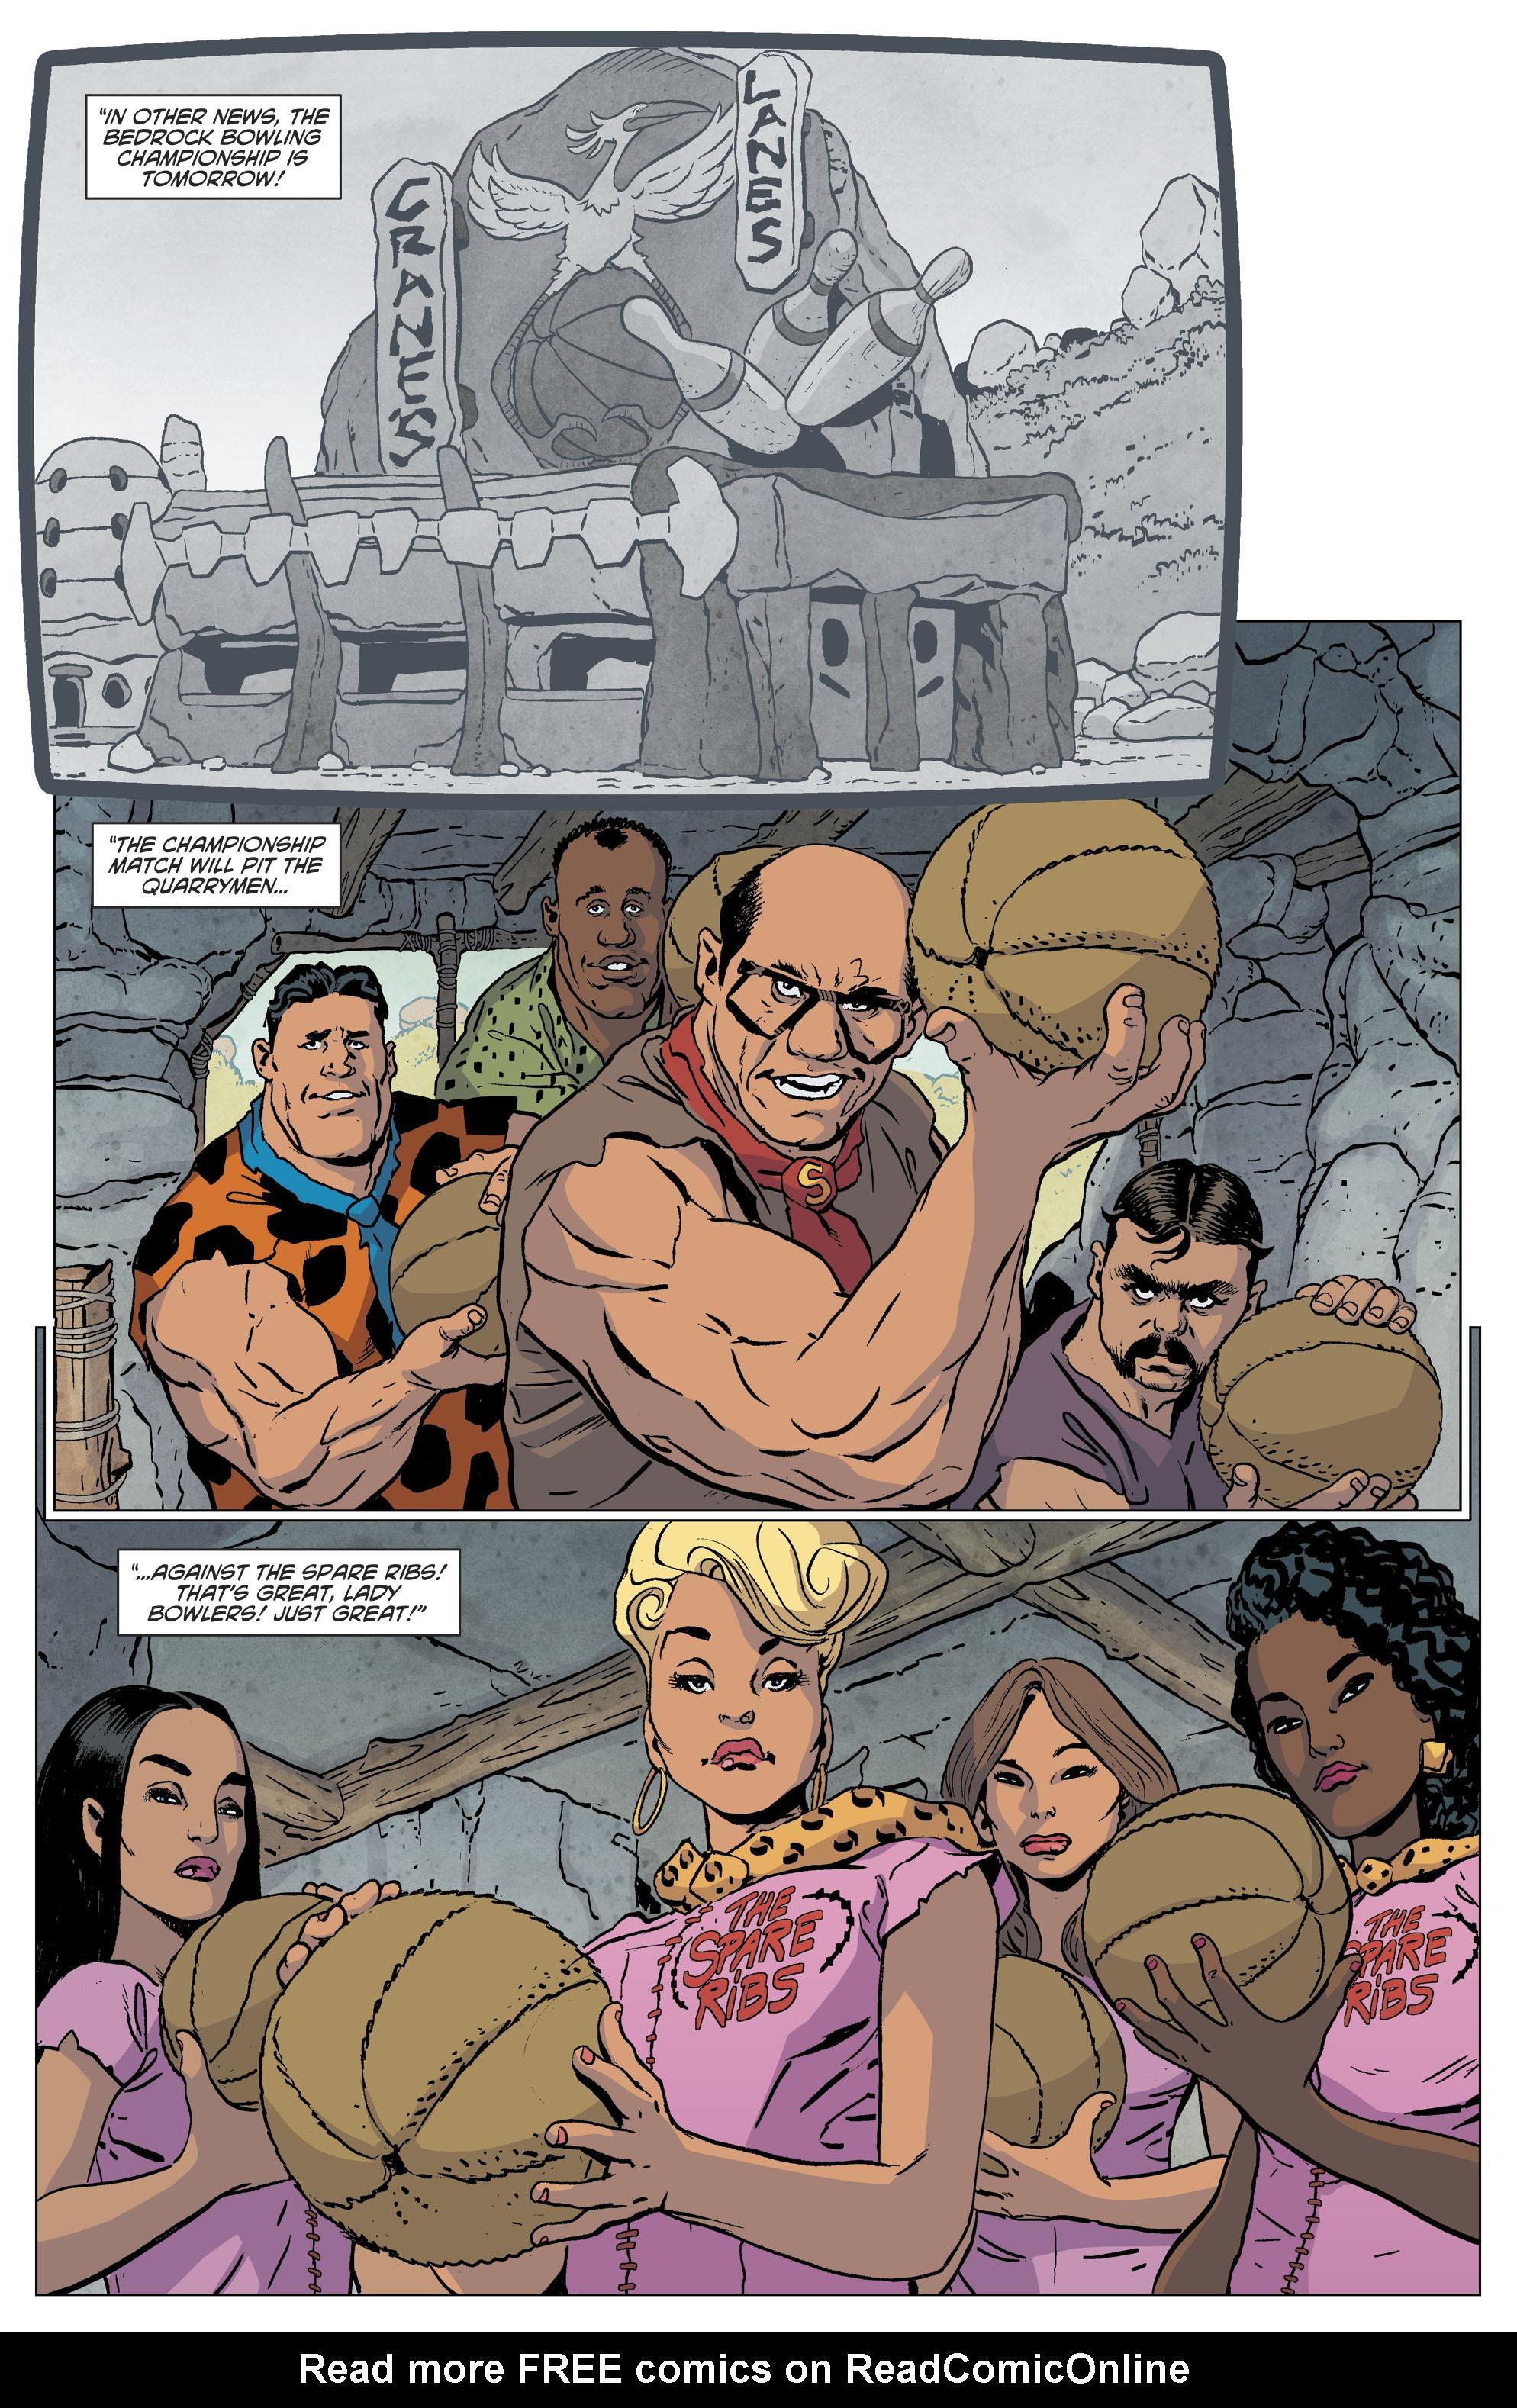 Read online The Flintstones comic -  Issue #12 - 8